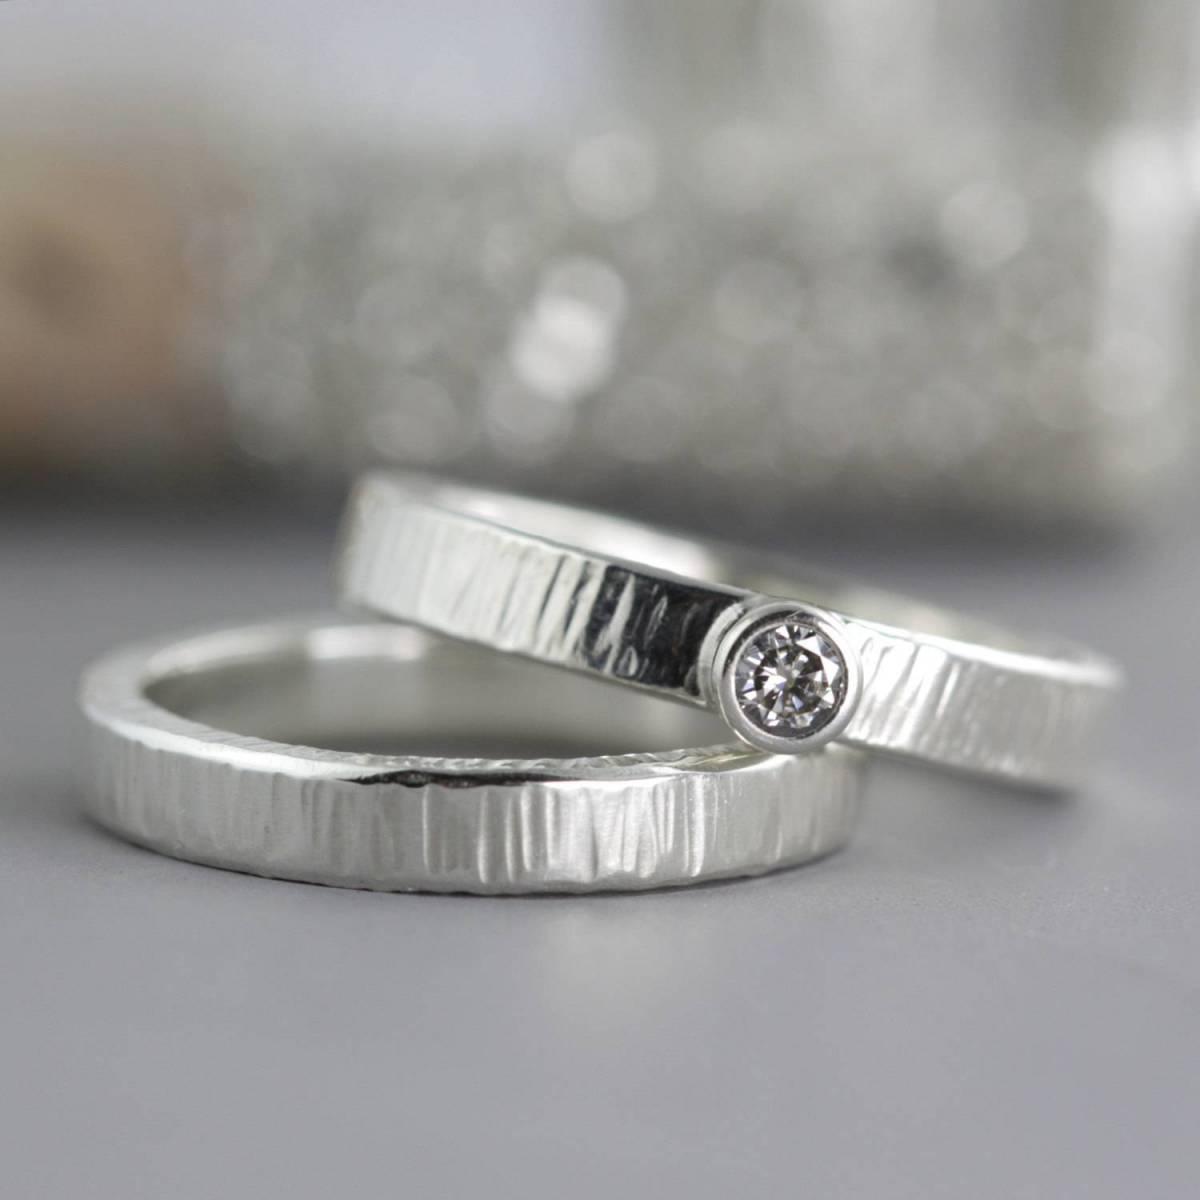 SarahHoodJewelryetsy.com Coin Edge Wedding Set – Engagement Wedding Ring Set – Sterling Silver Wedding Band – Moissanite Ring $265+